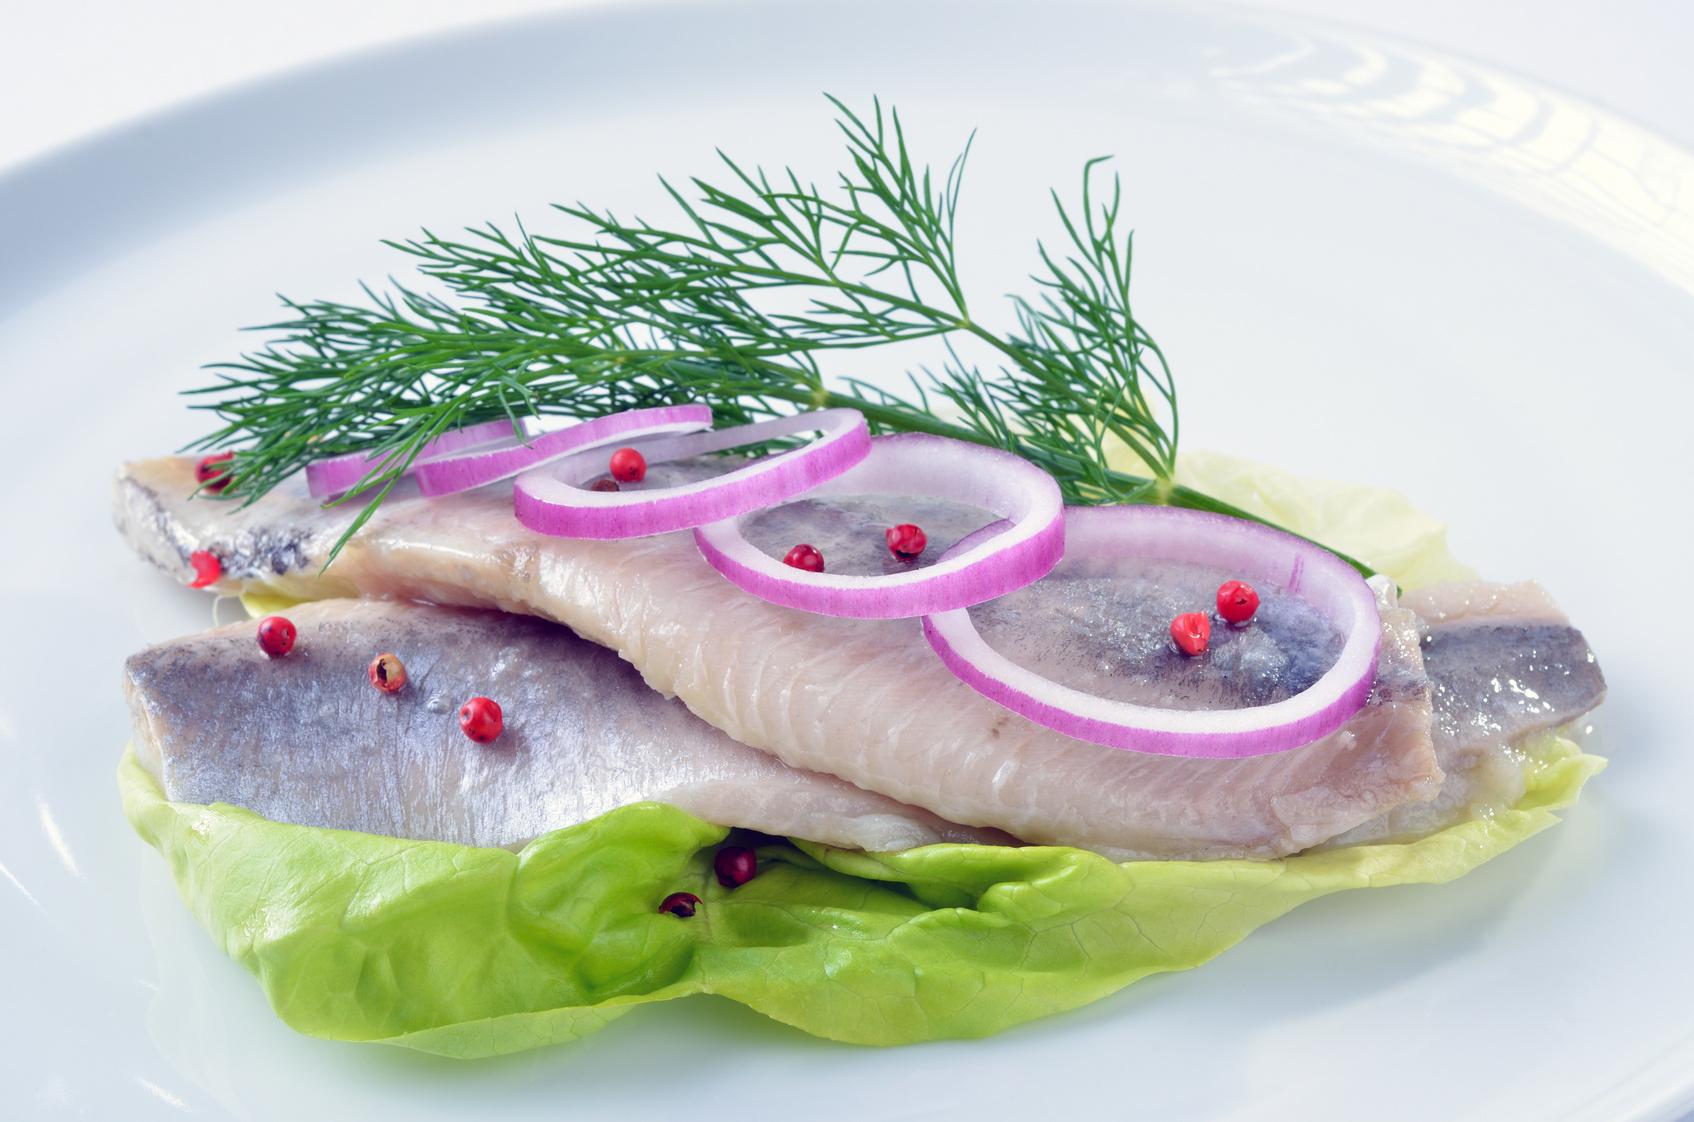 Salzheringe auf Salatblatt